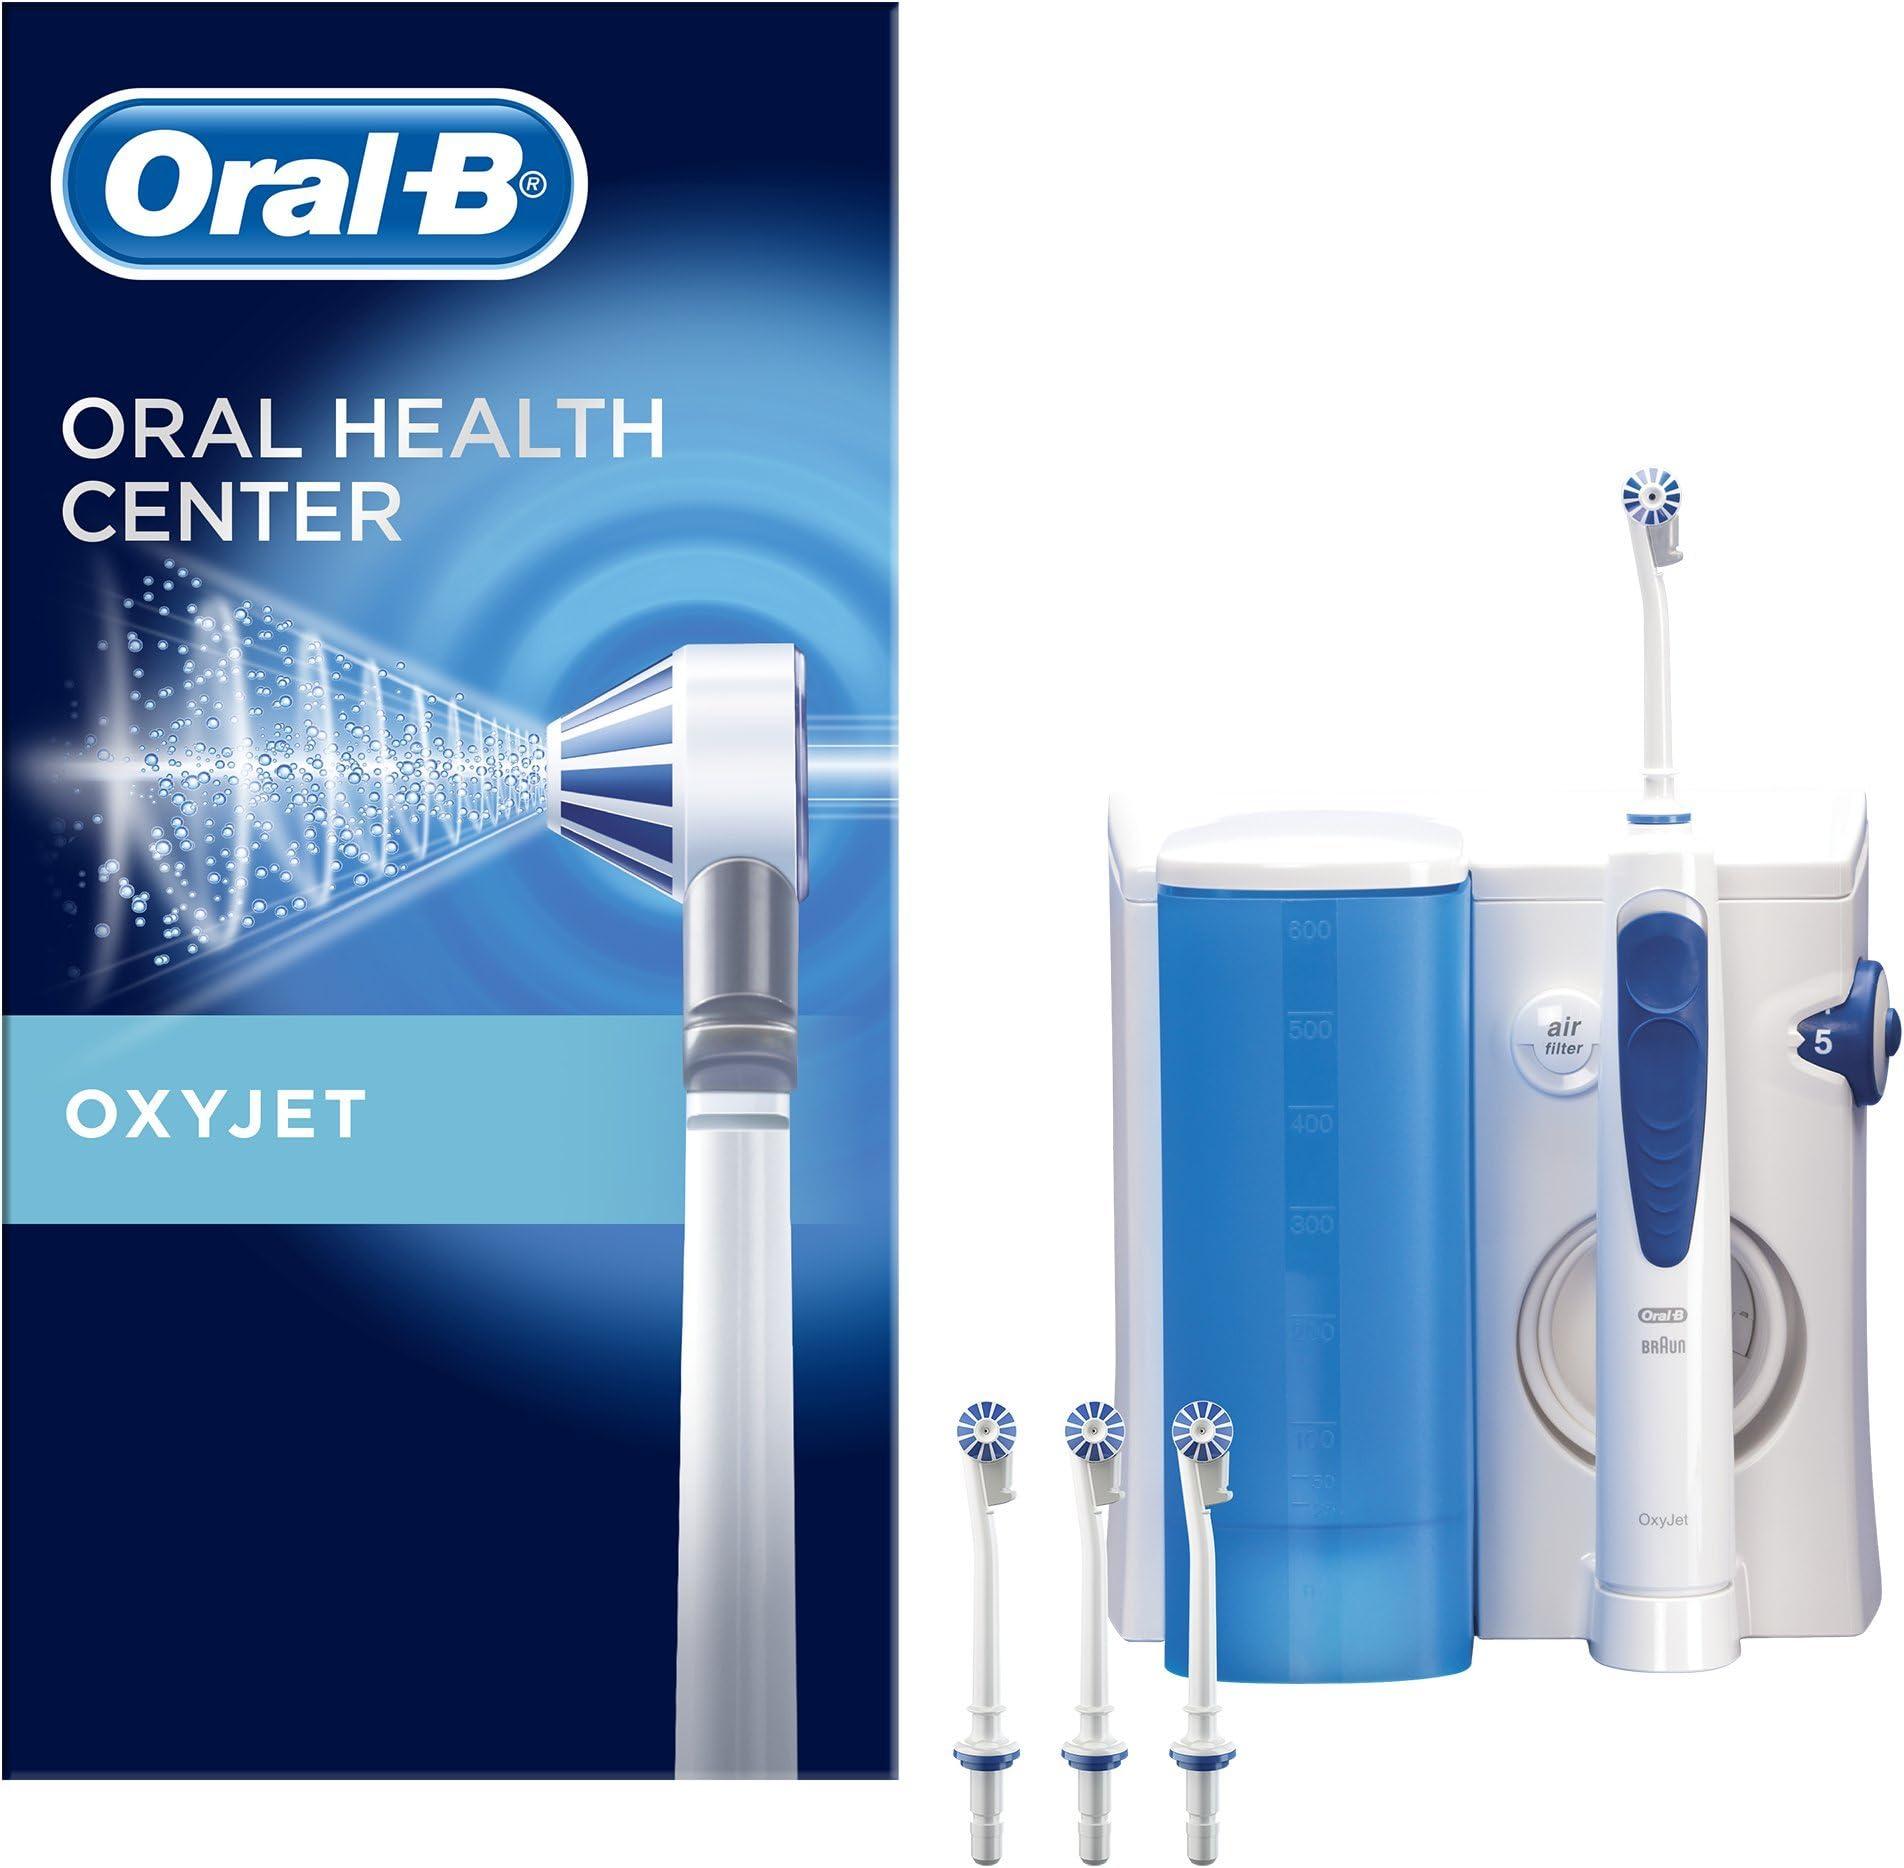 Irrigador dental oral b chile